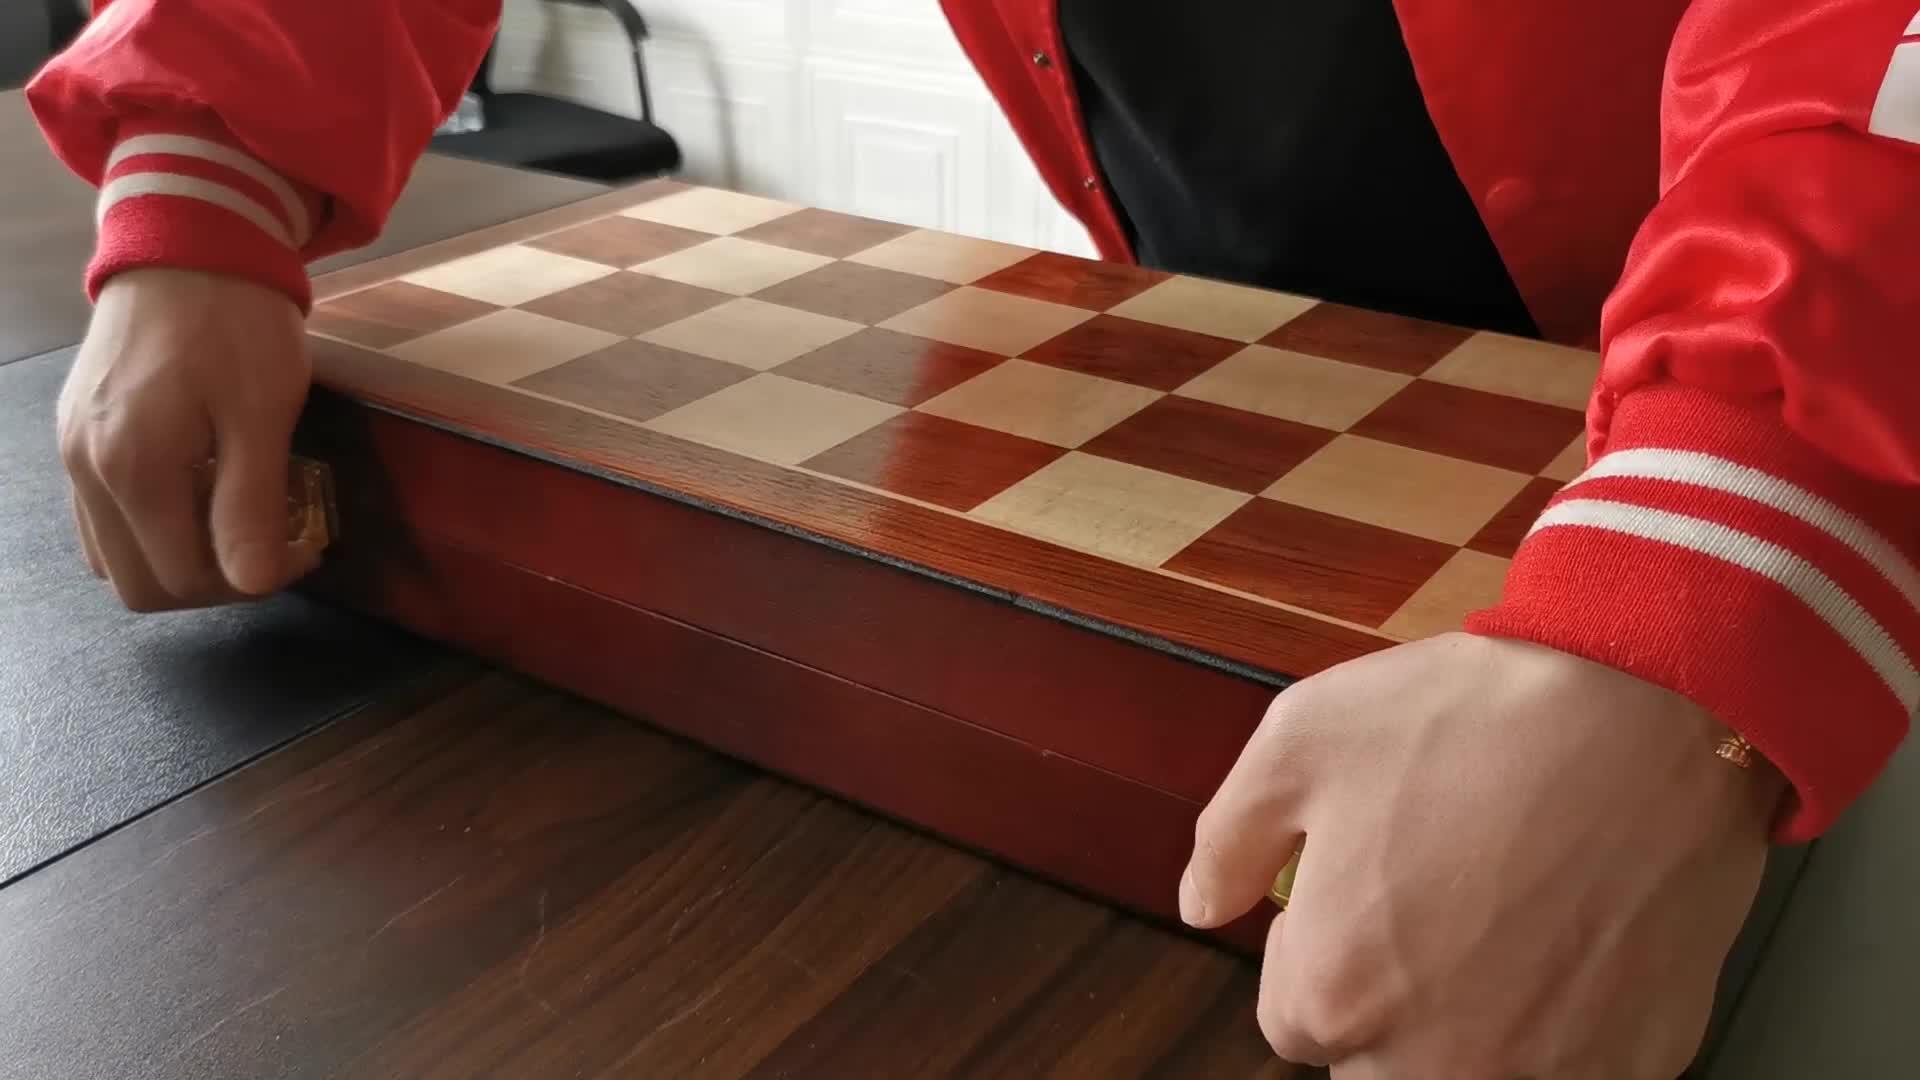 Metal Deluxe Wood Board Storage Chess Set